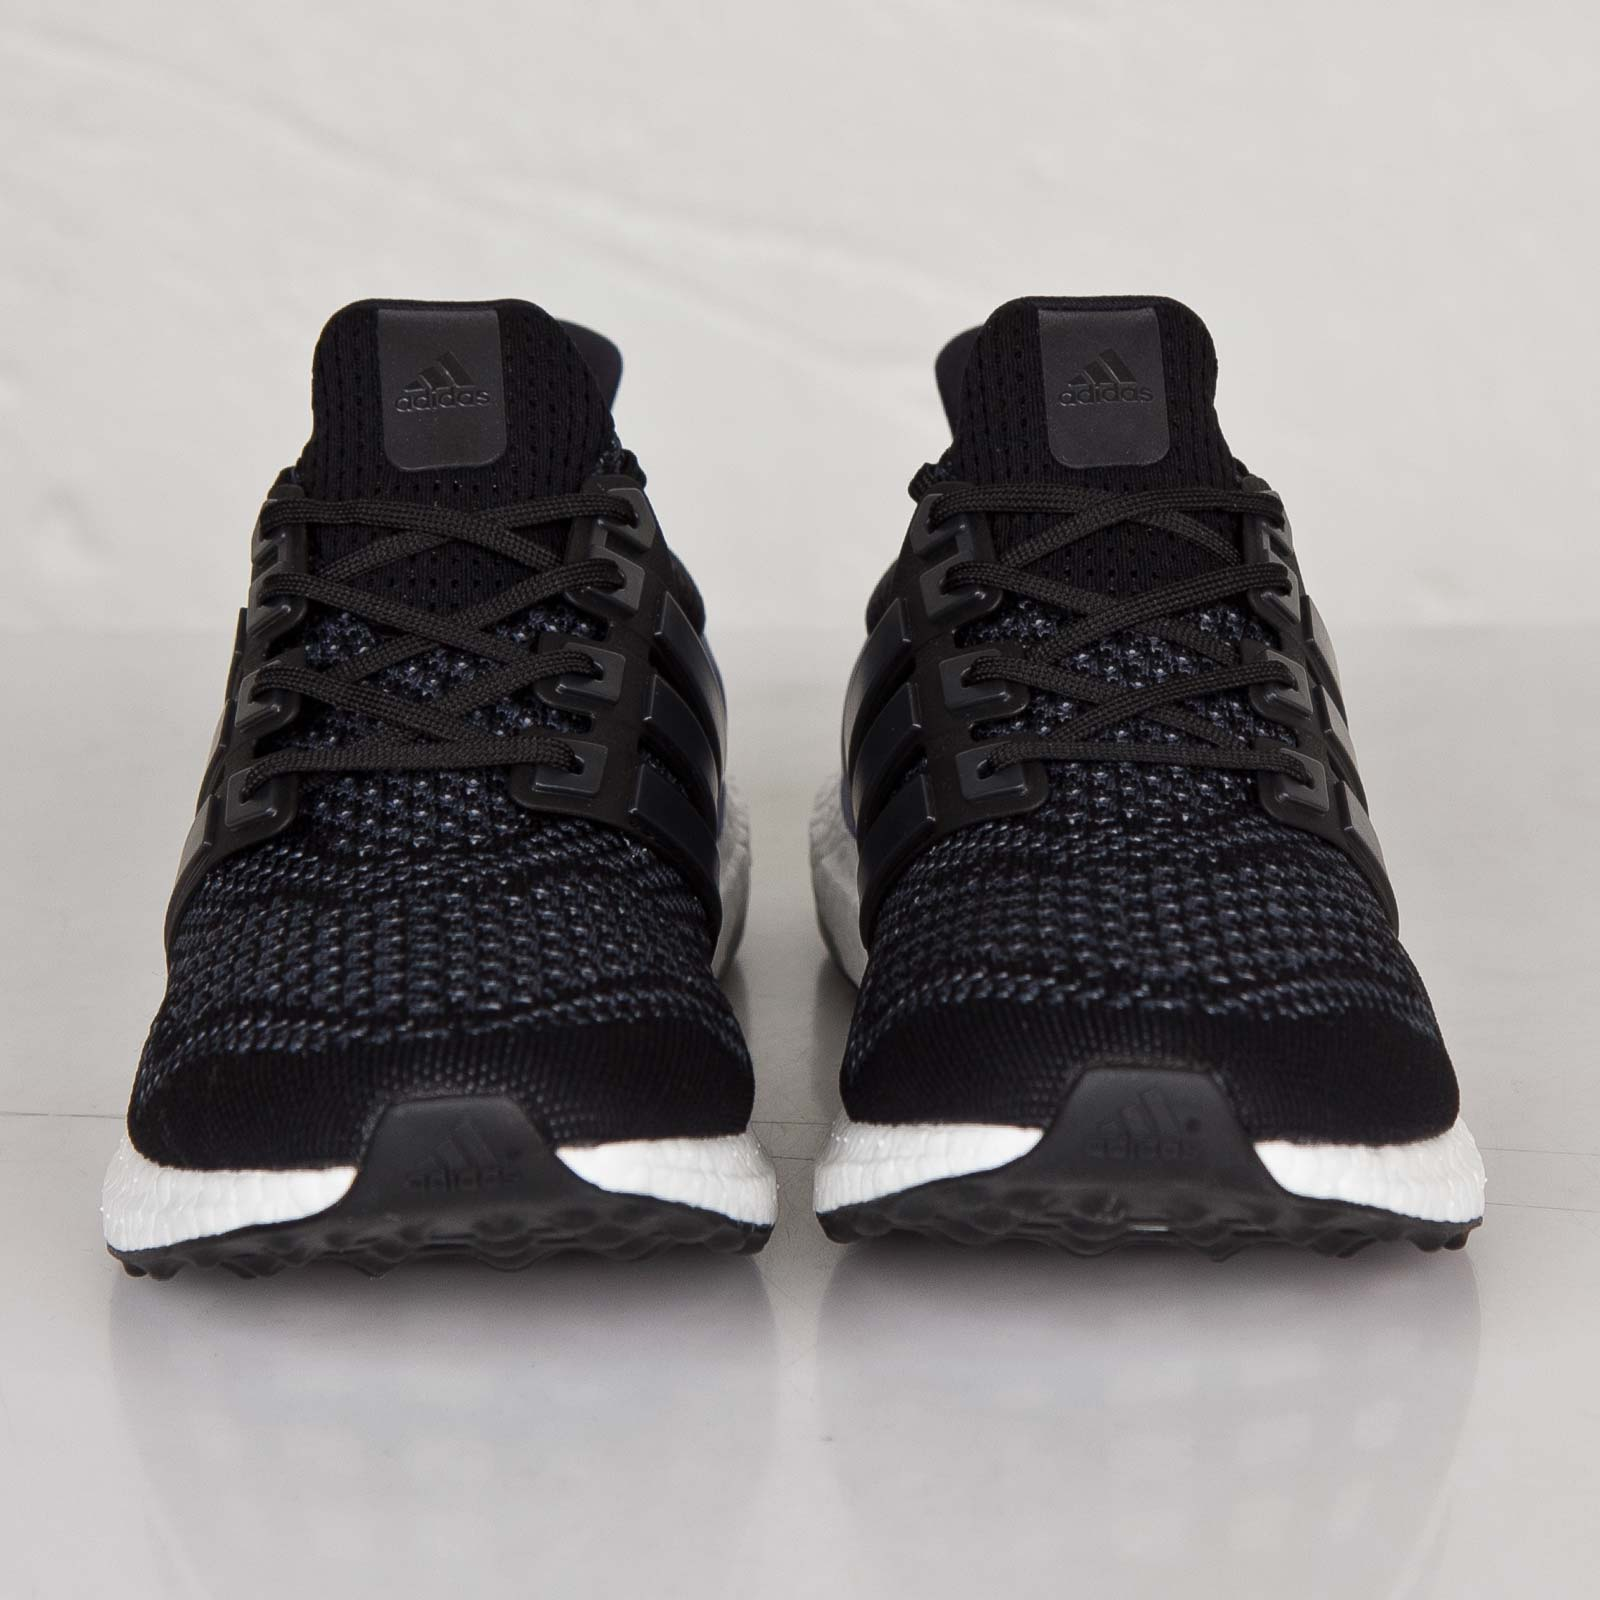 new products 3fd1d f39f0 adidas ultra boost m - B27171 - Sneakersnstuff | sneakers ...